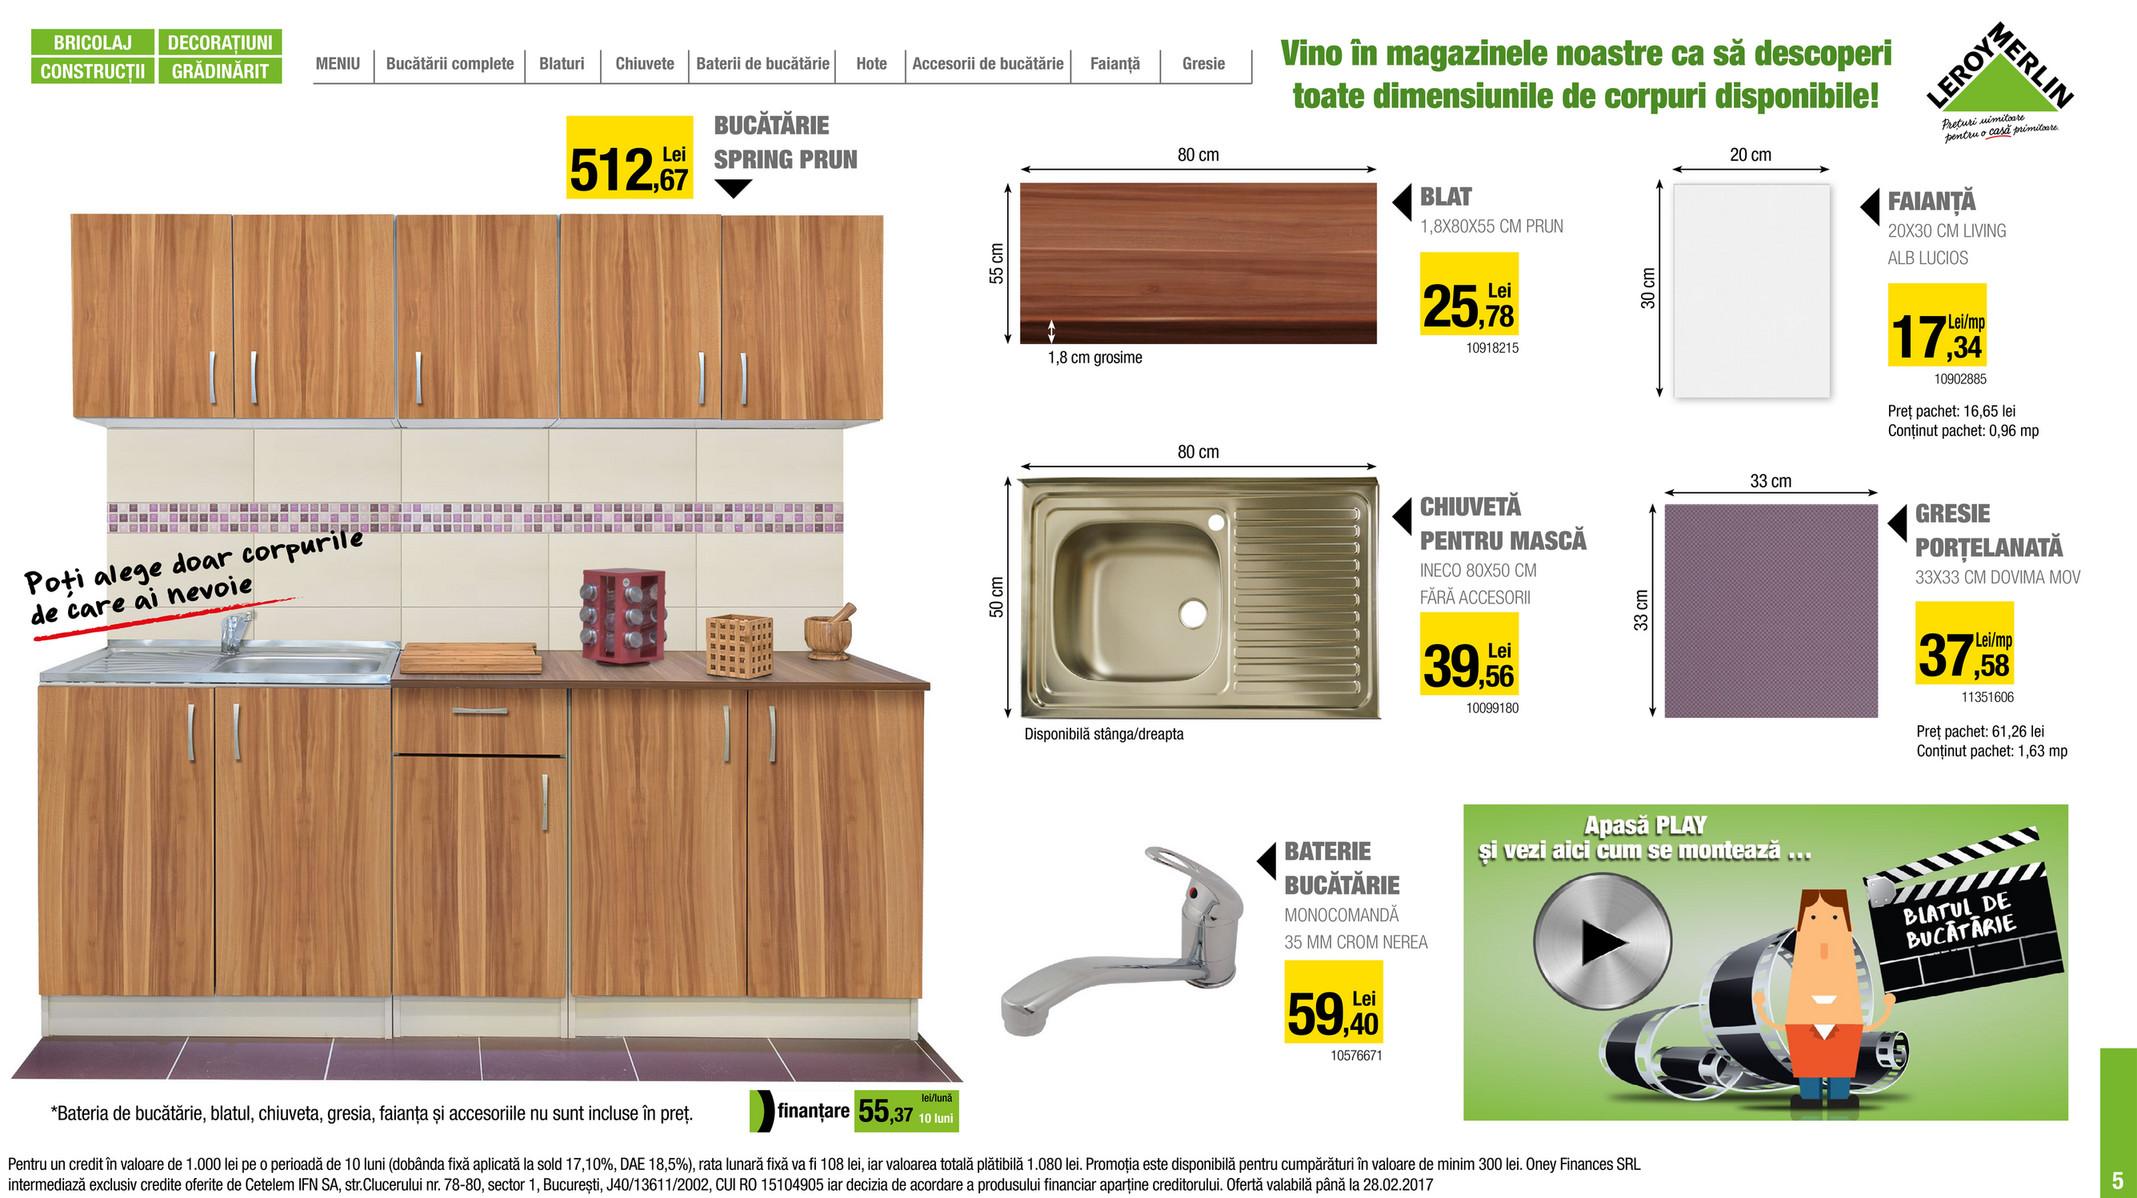 leroy merlin romania catalog leroy merlin bucatarii 2017. Black Bedroom Furniture Sets. Home Design Ideas